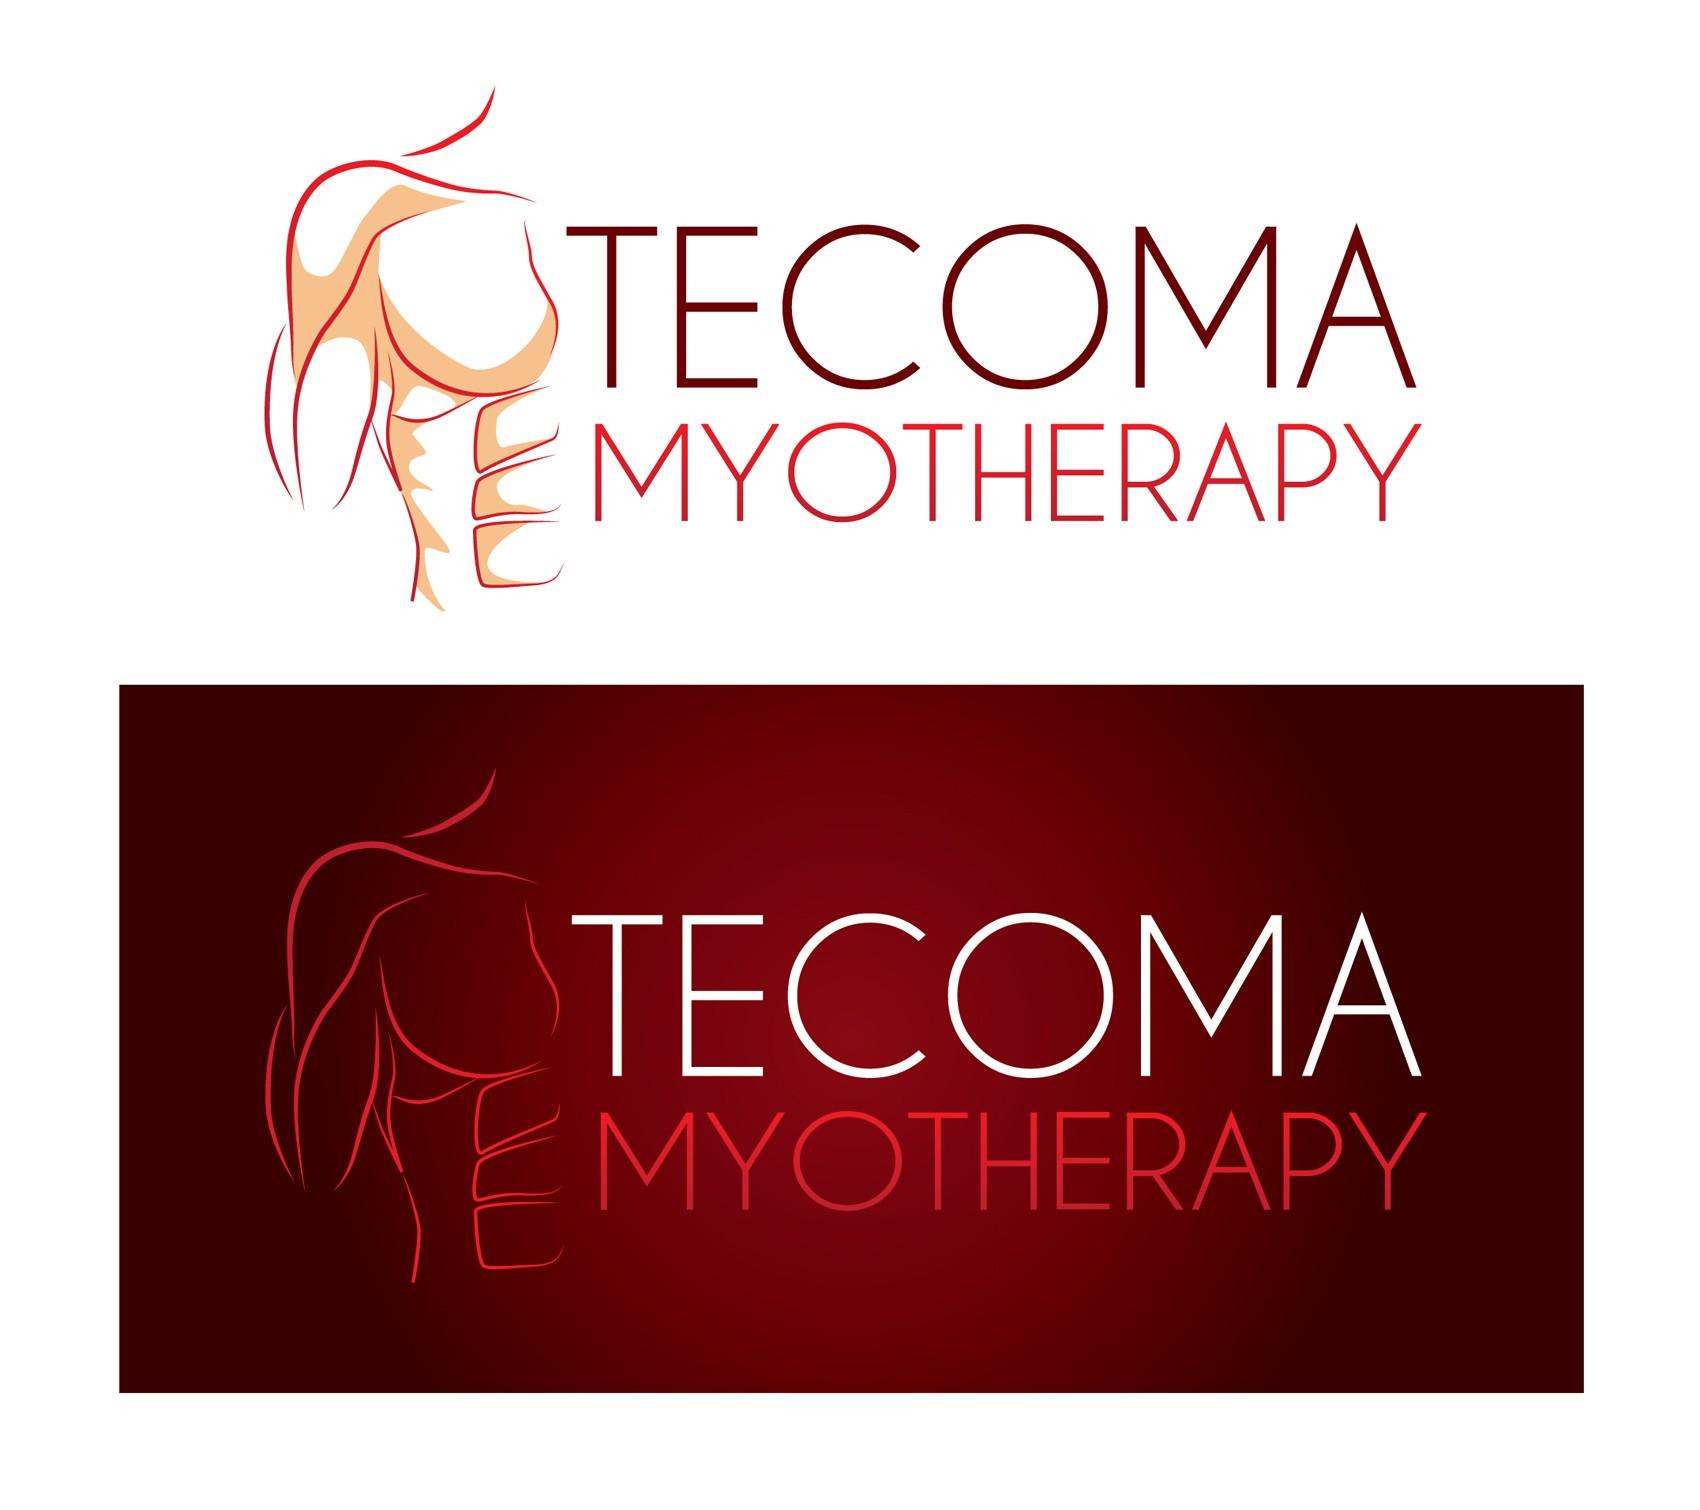 create a wining logo for Tecoma Myotherapy